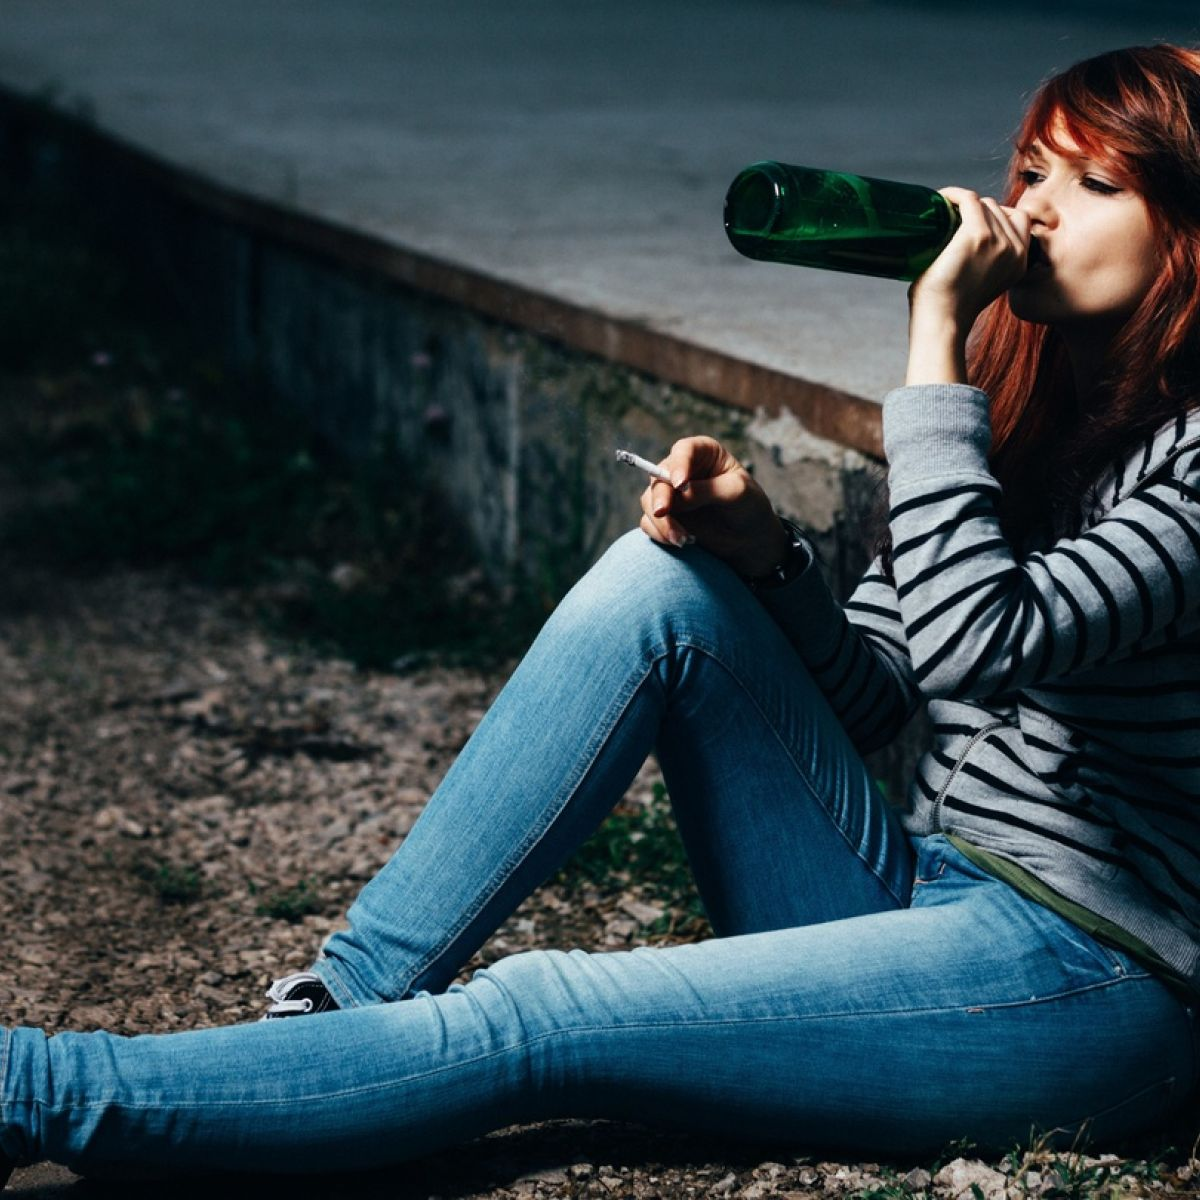 Raising awareness of domestic violence among teens, Guest